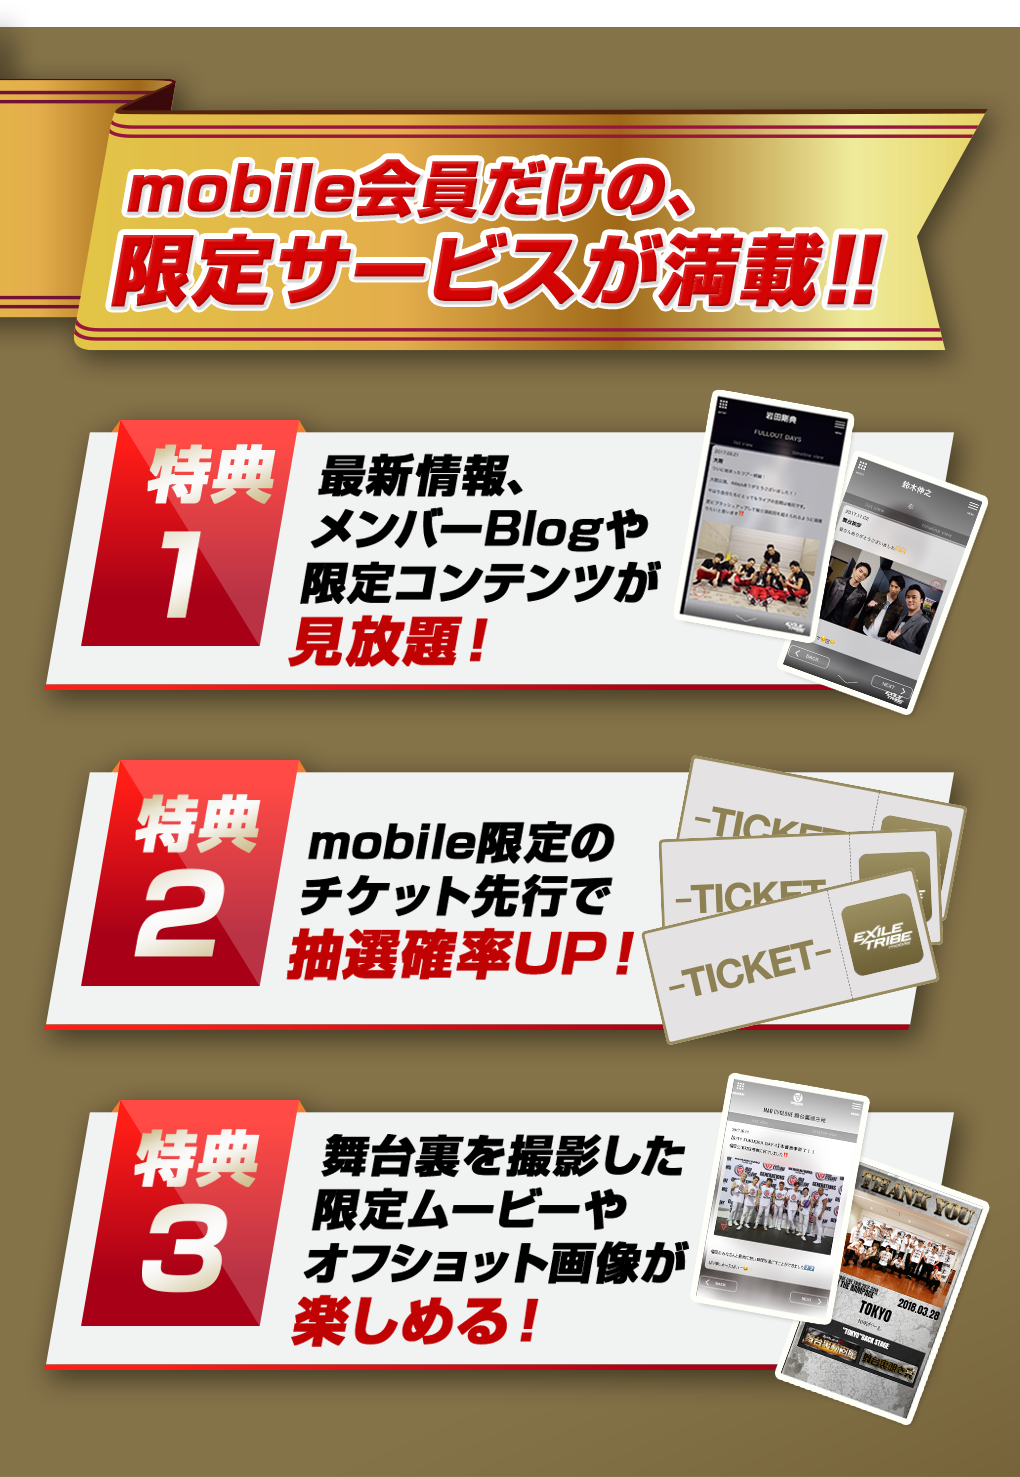 mobile会員だけの、限定サービスが満載!!